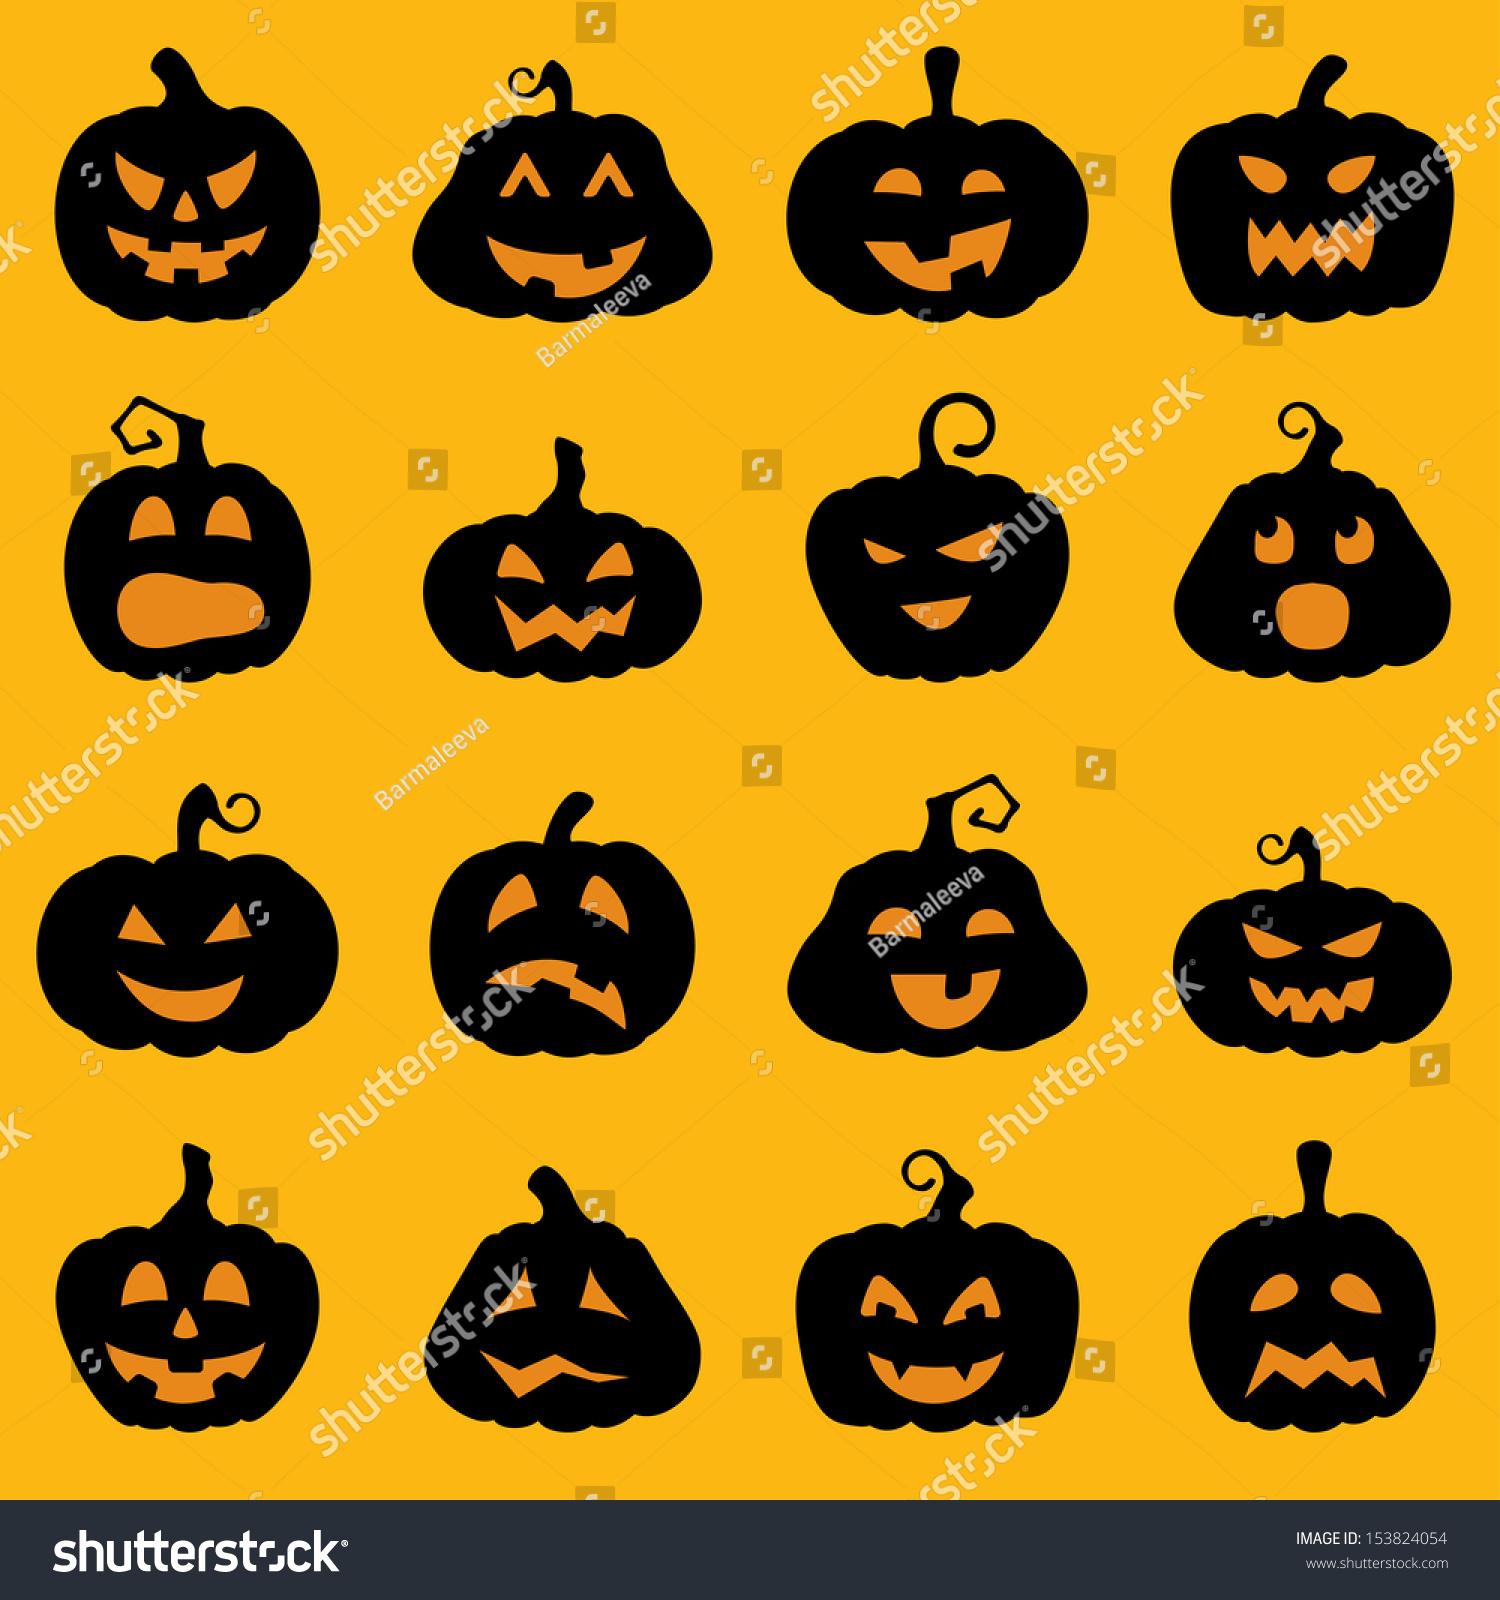 Halloween Decoration Jackolantern Silhouette Set Pumpkins Stock Vector